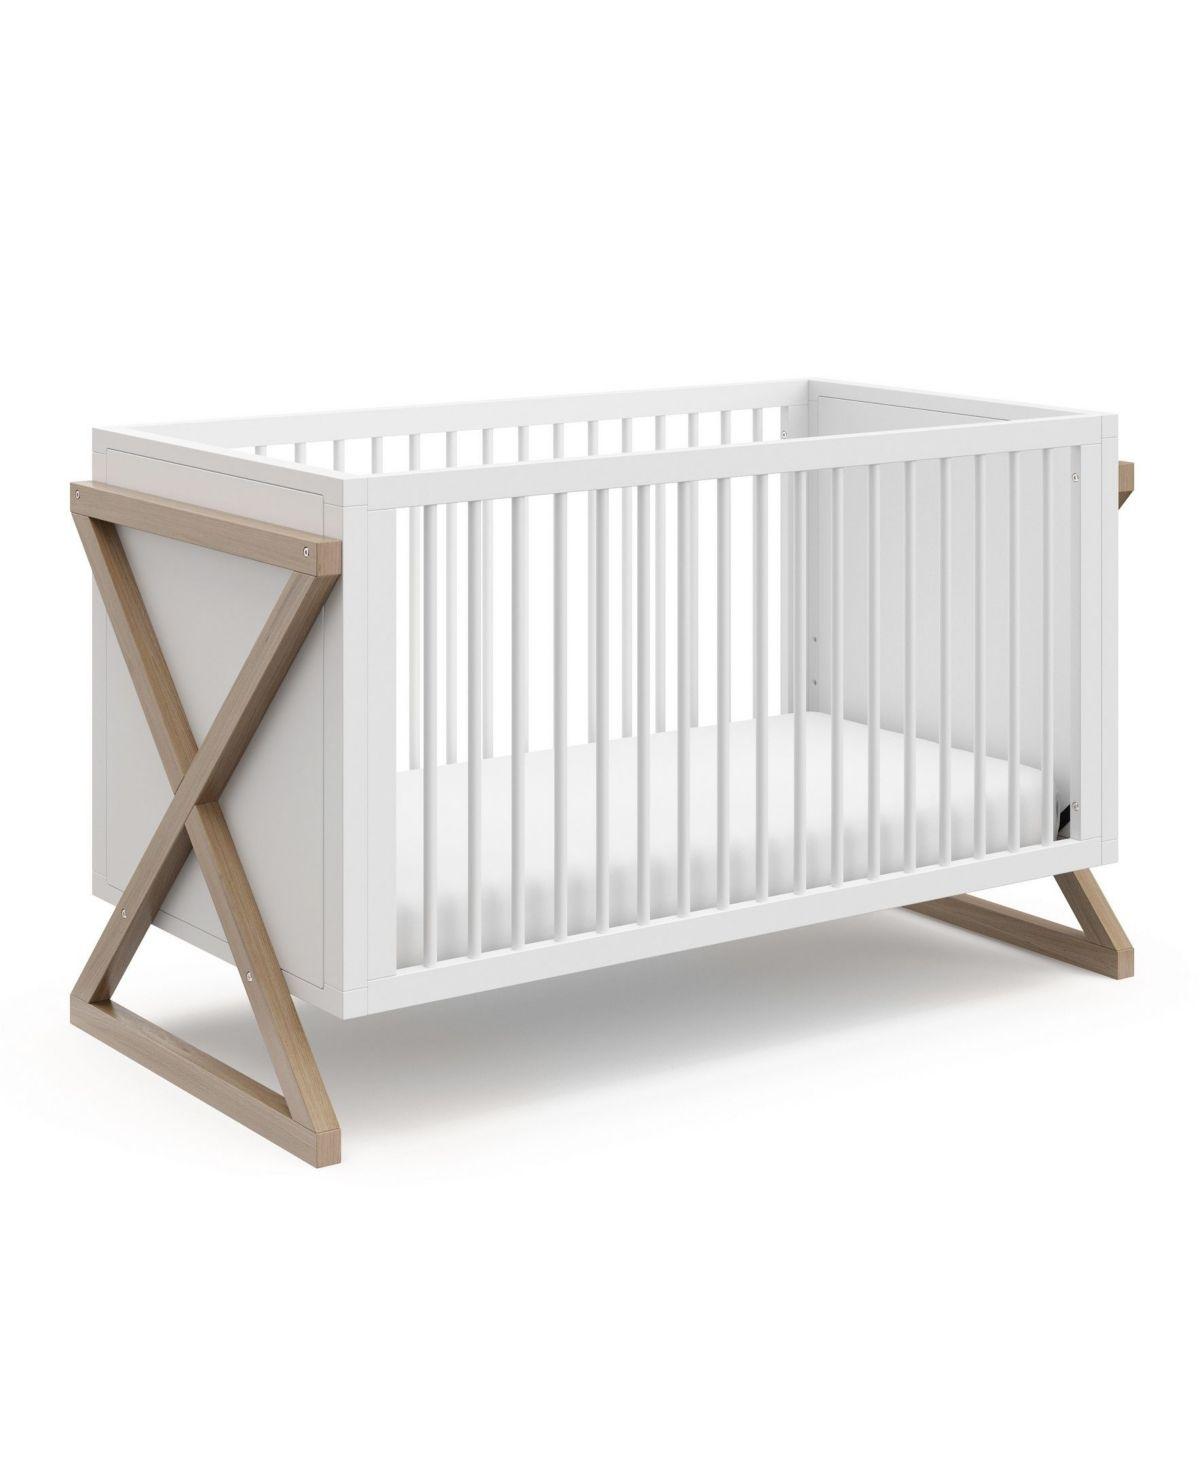 Storkcraft Equinox 3 In 1 Convertible Crib Dark Beige Cribs